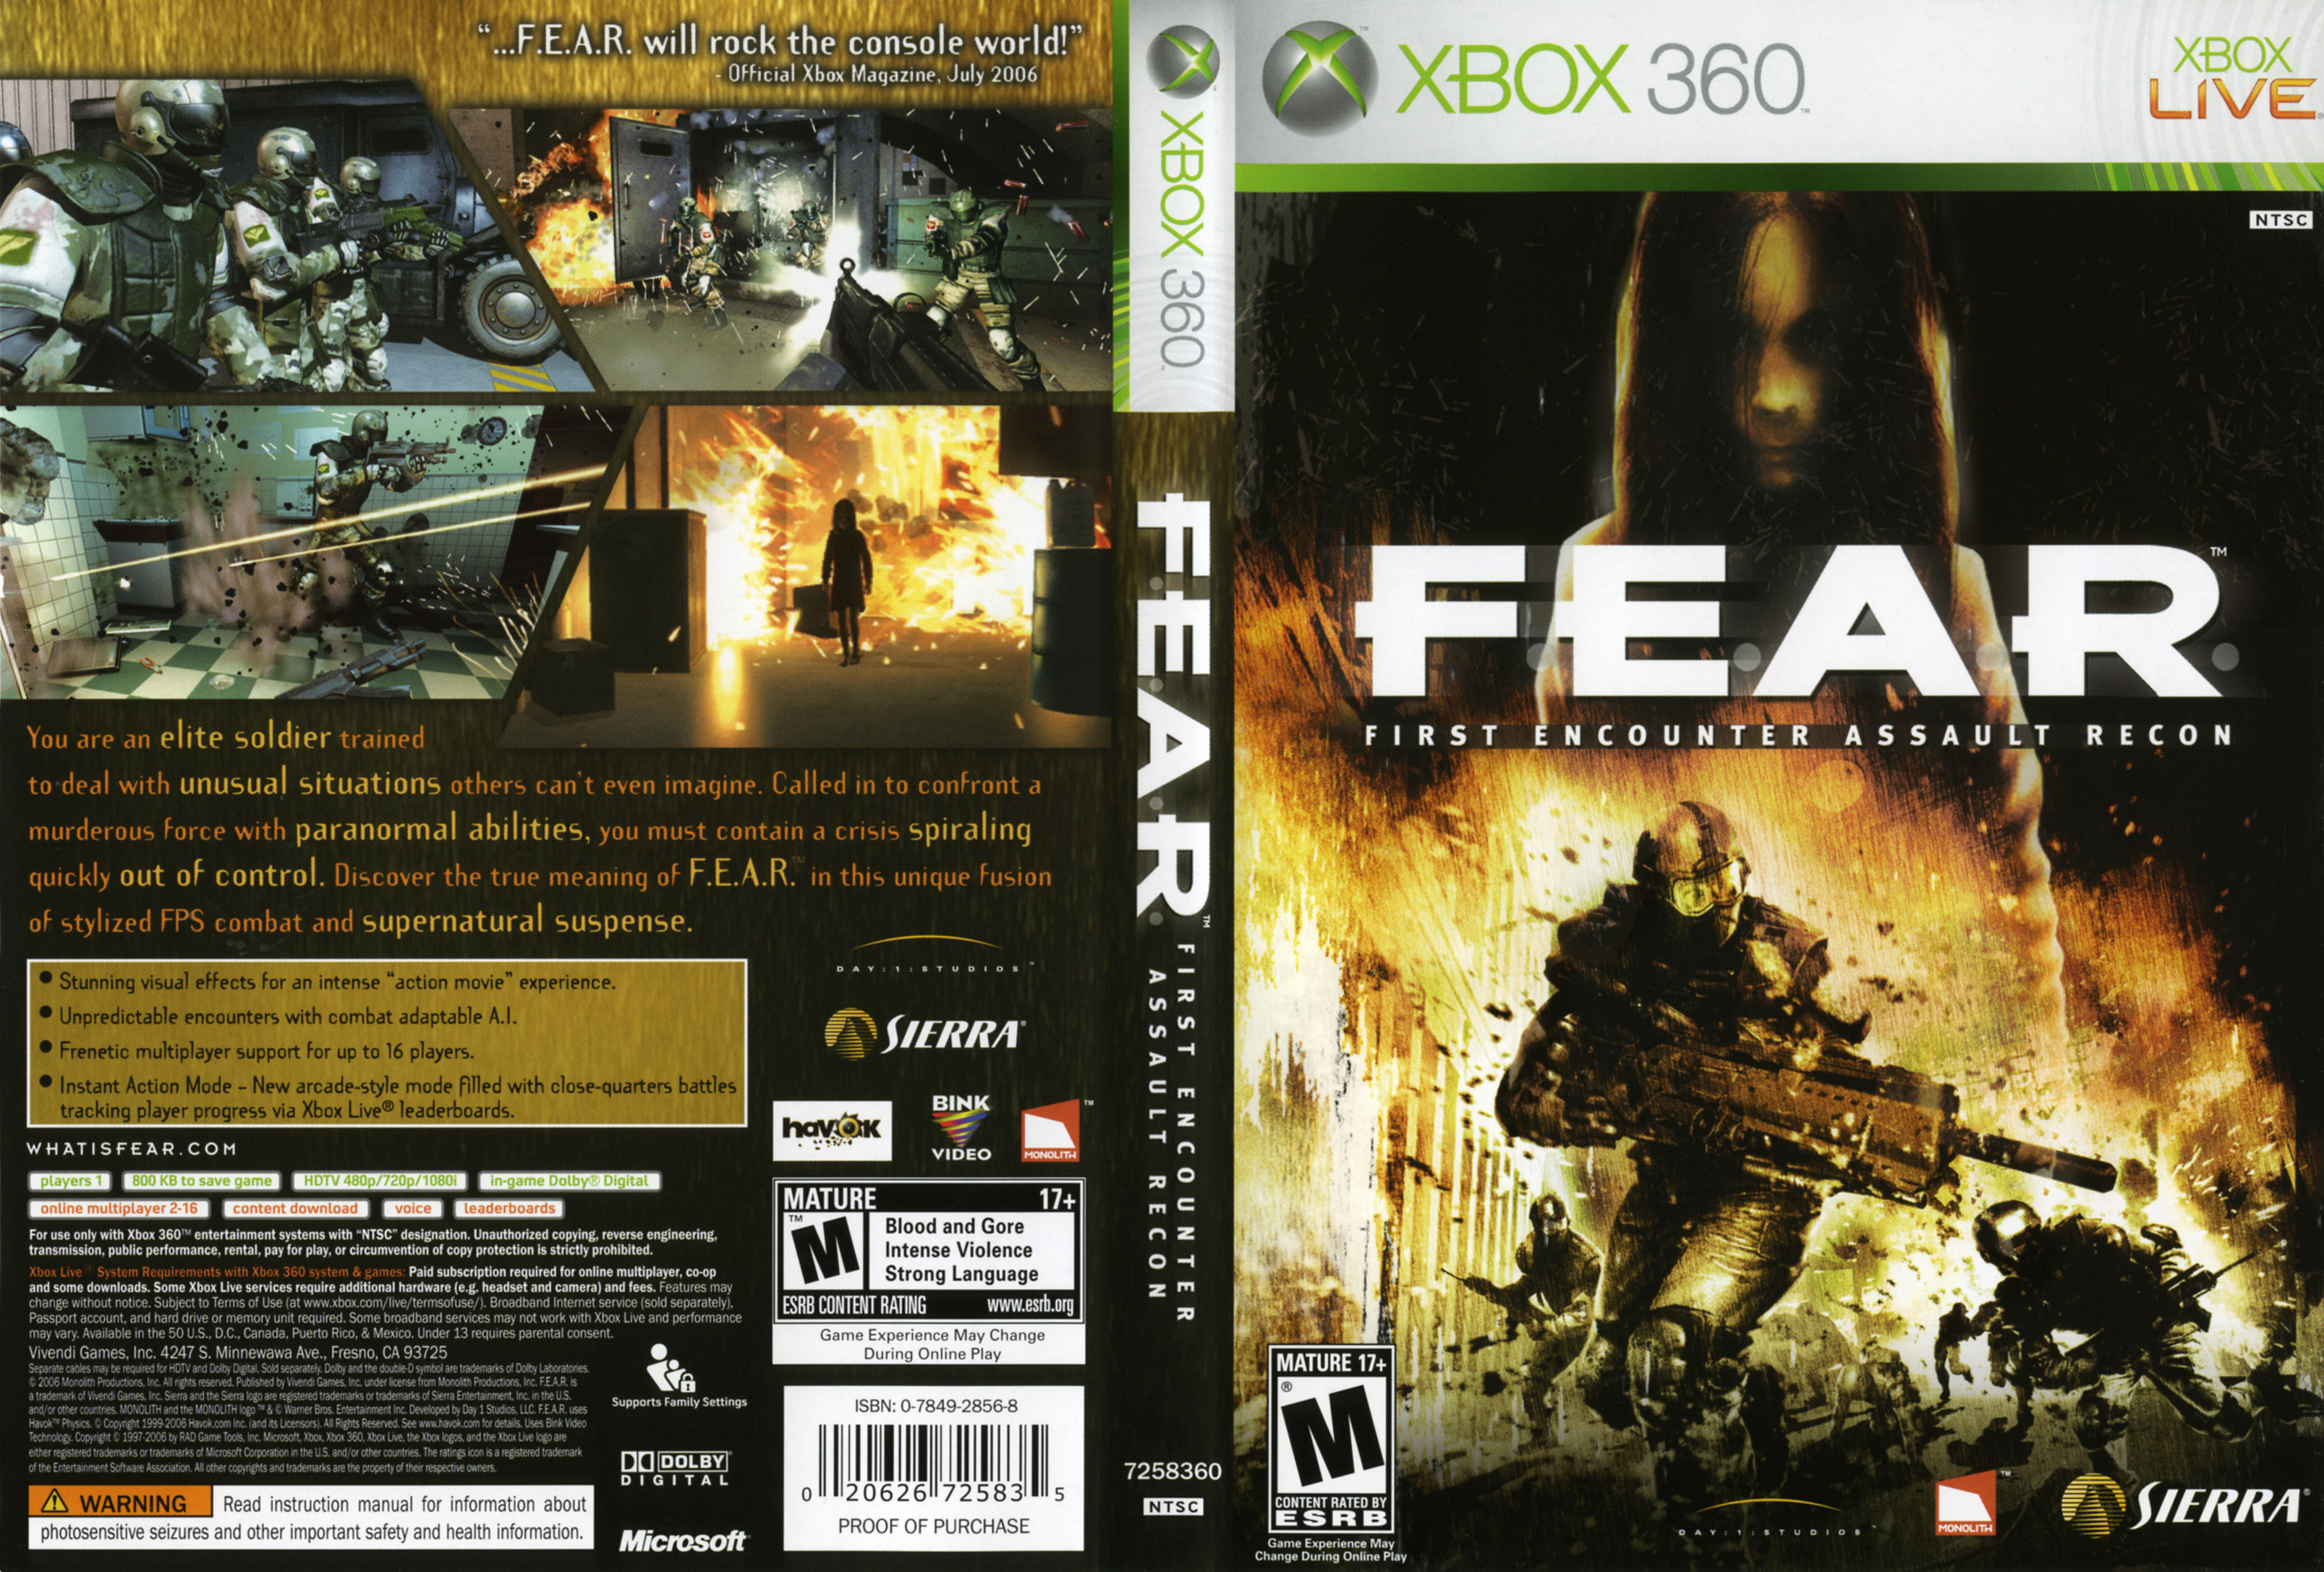 Microsoft Xbox 360 - Lista de juegos y Hardware on online xbox 360, jugar xbox 360, home xbox 360, games xbox 360, spider-man 1 xbox 360, spiderman friend or foe xbox 360,